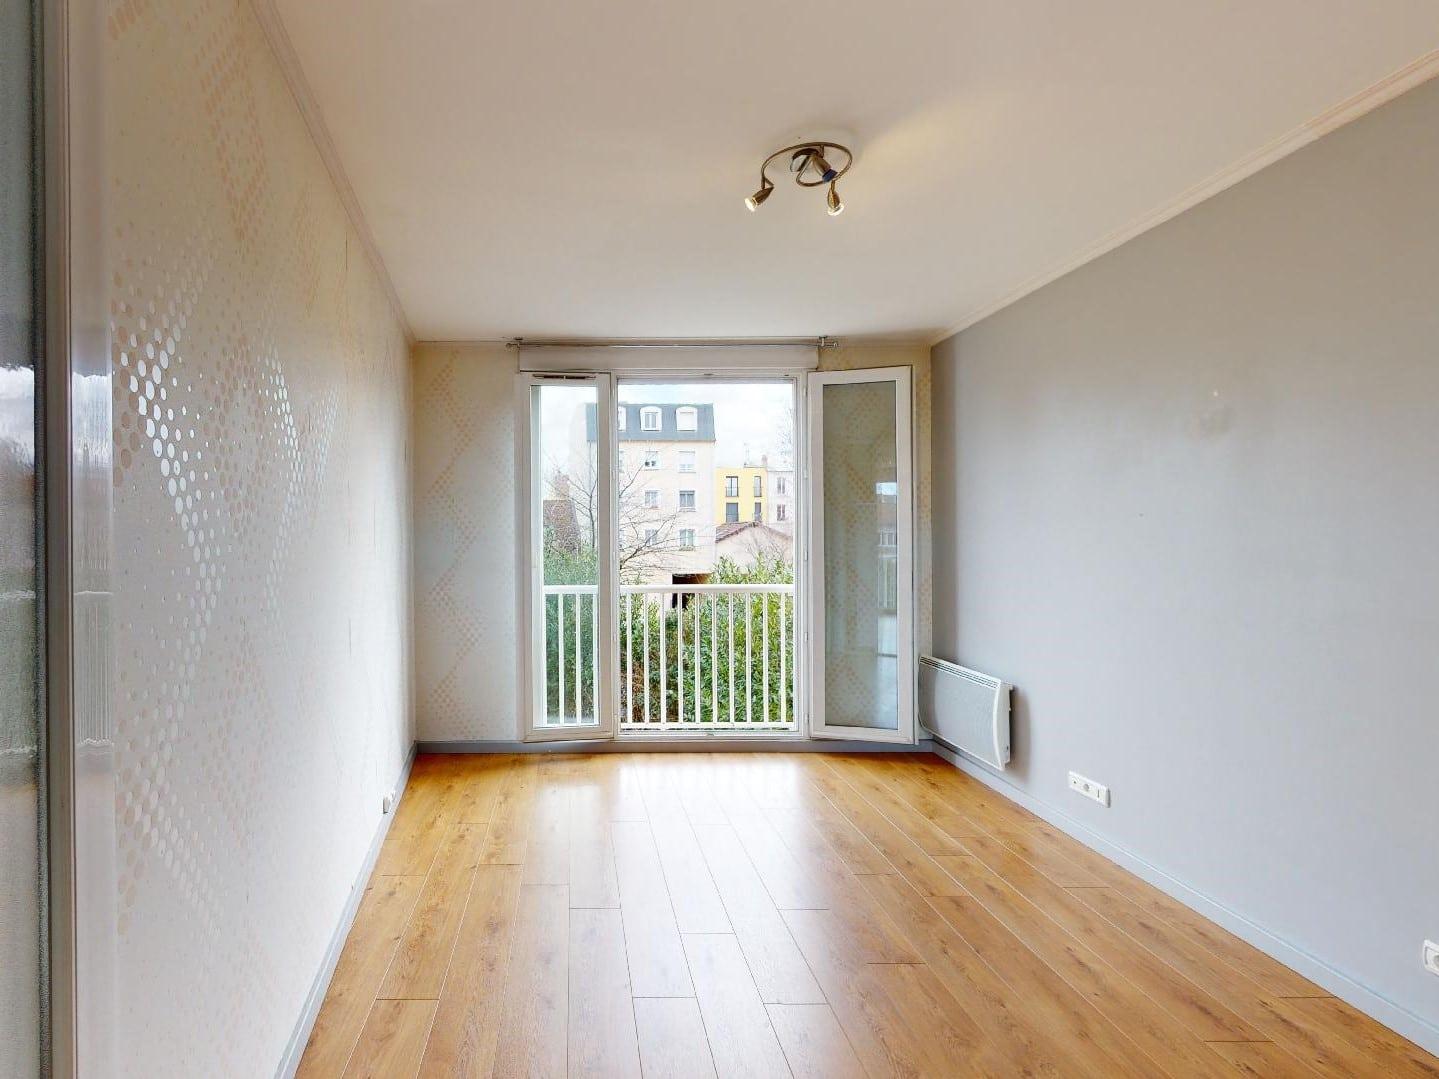 alfortville appartement location: 4 pièces, 2° chambre à coucher lumineuse, ressing